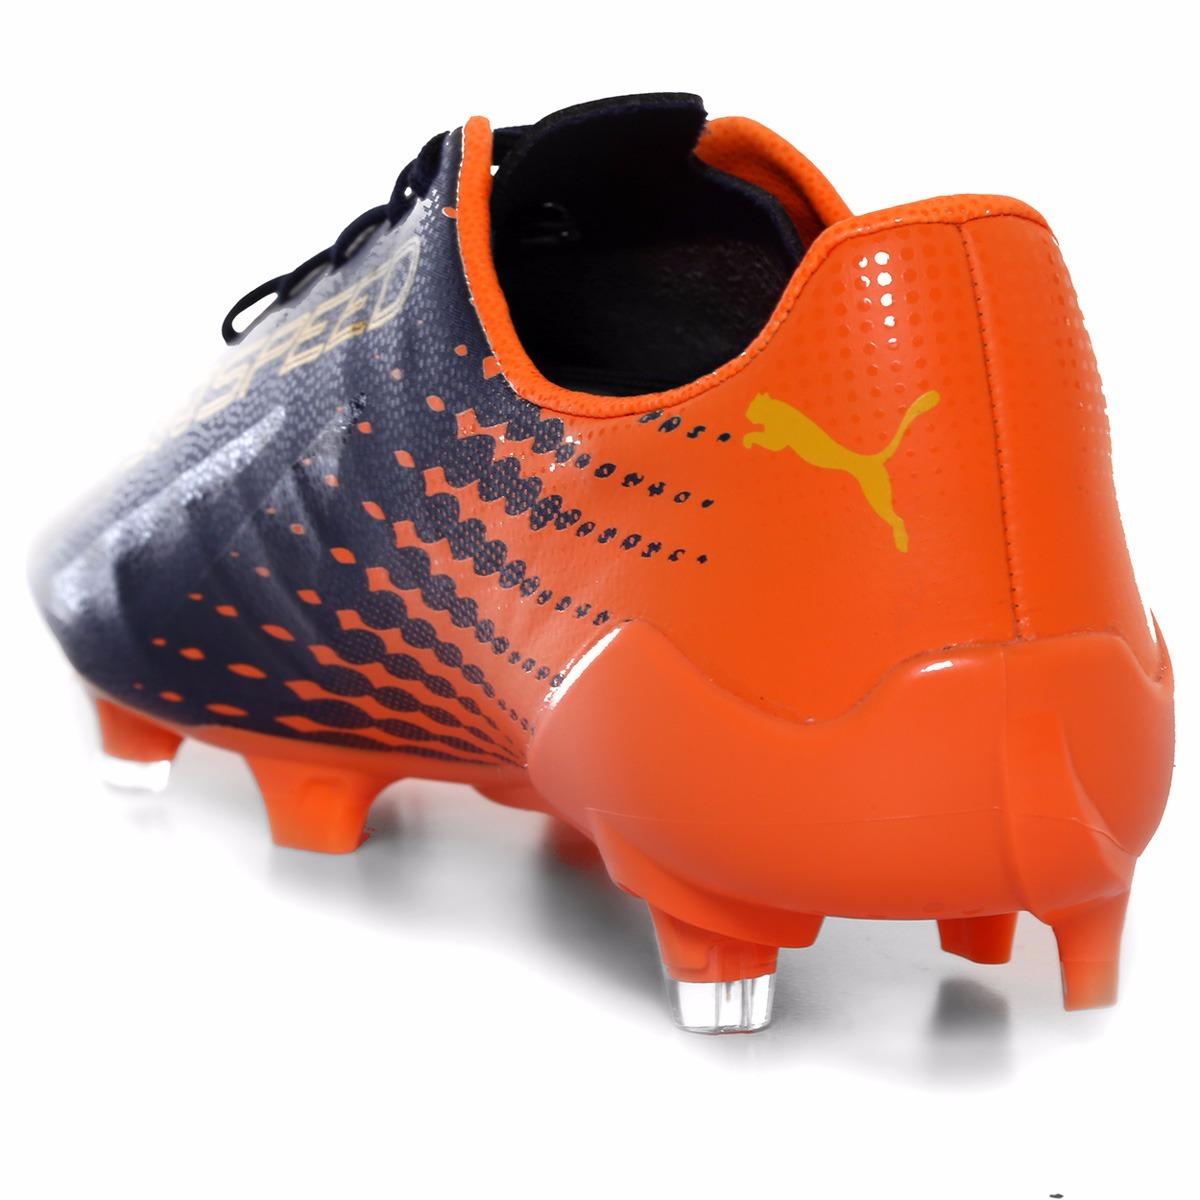 Taquetes De Futbol Puma Evospeed Amarillo Y Naranja Original ... 9467e24e9577e